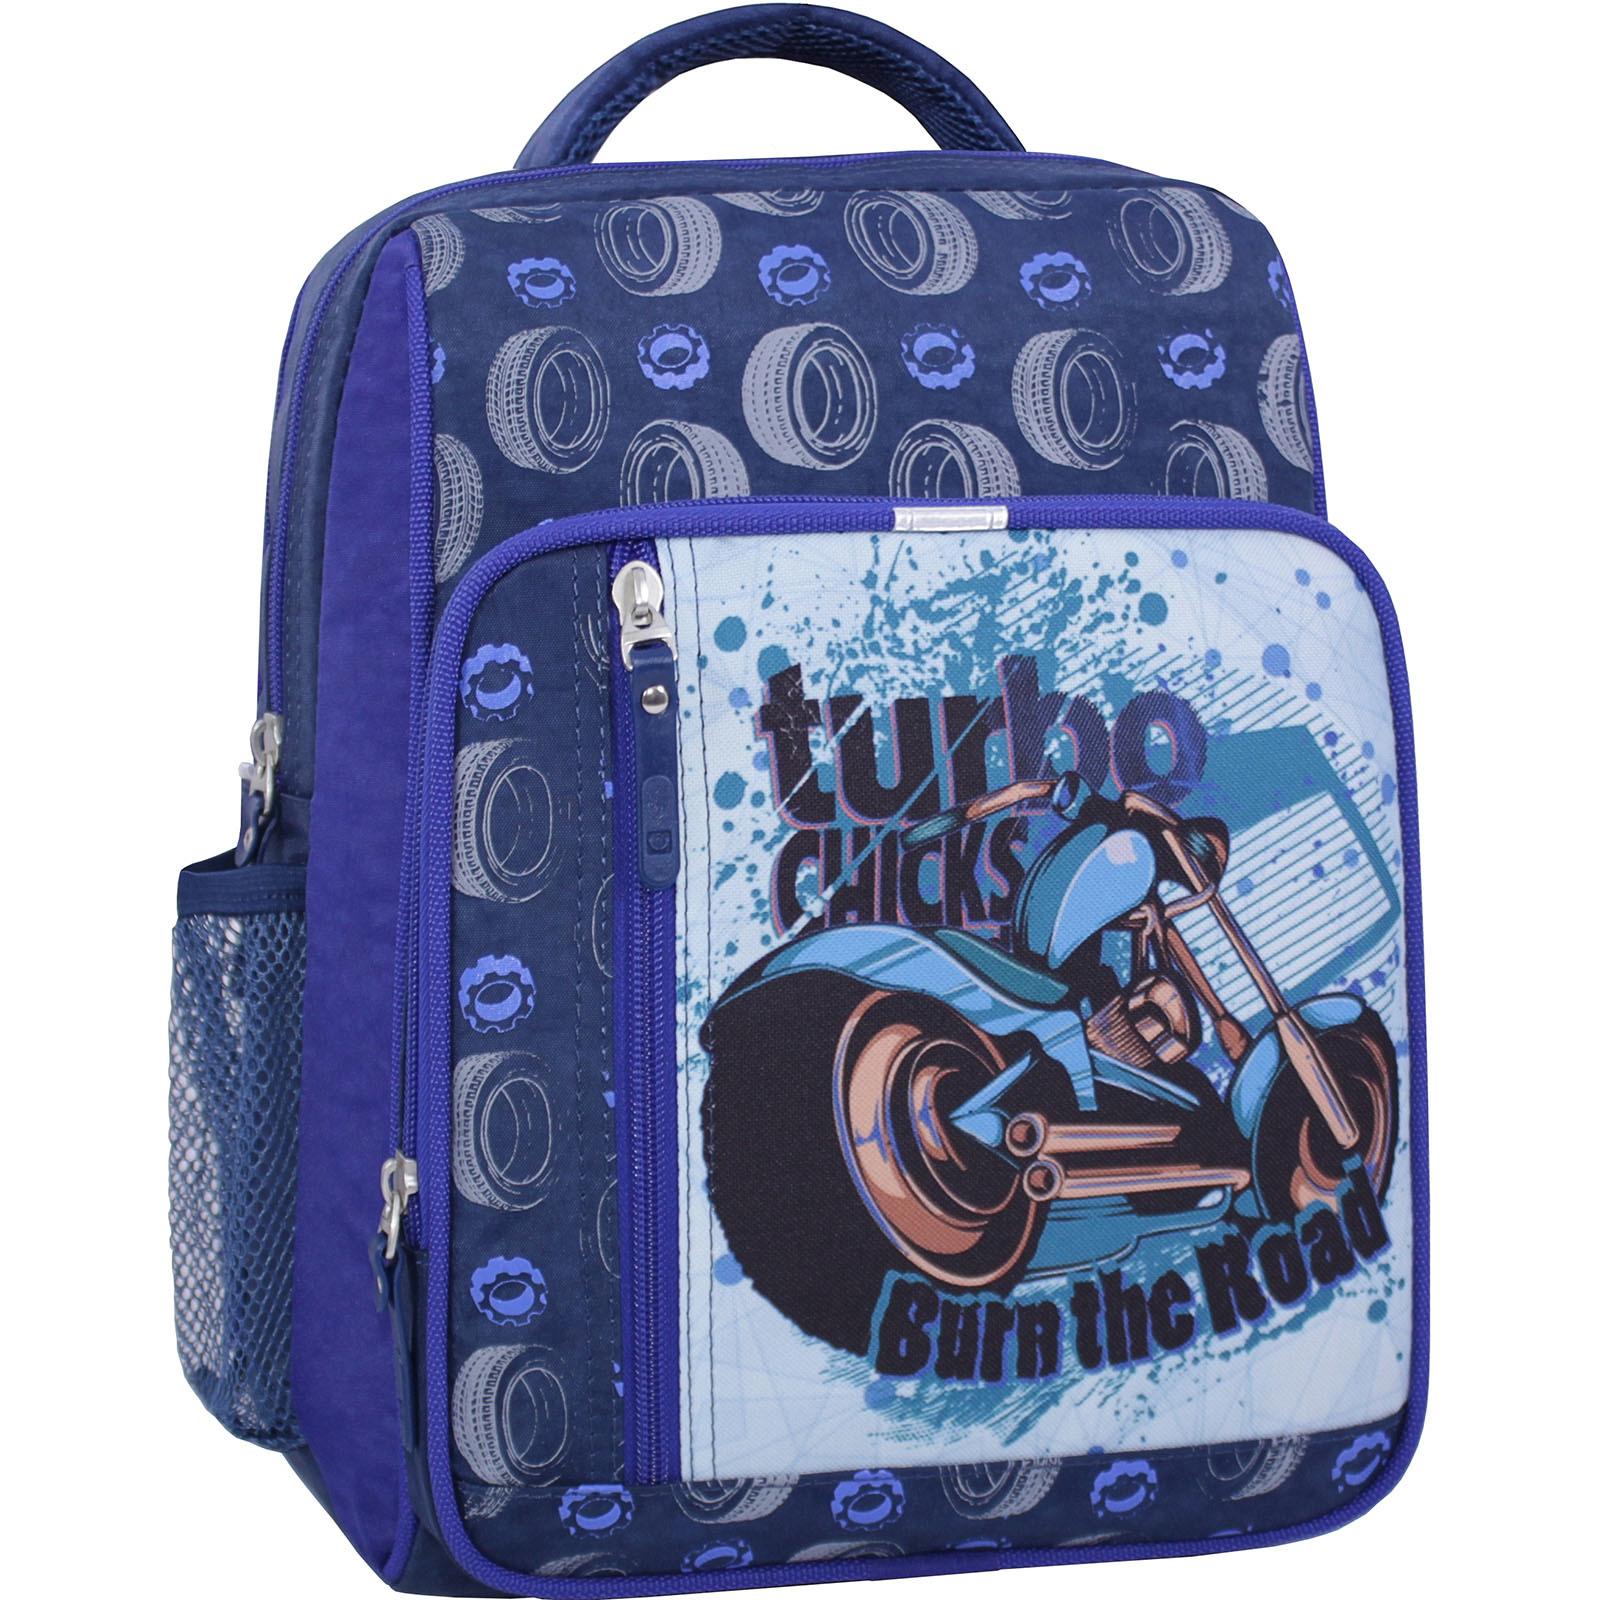 Школьные рюкзаки Рюкзак школьный Bagland Школьник 8 л. 225 синий 551 (00112702) IMG_2533_суб.551_.JPG